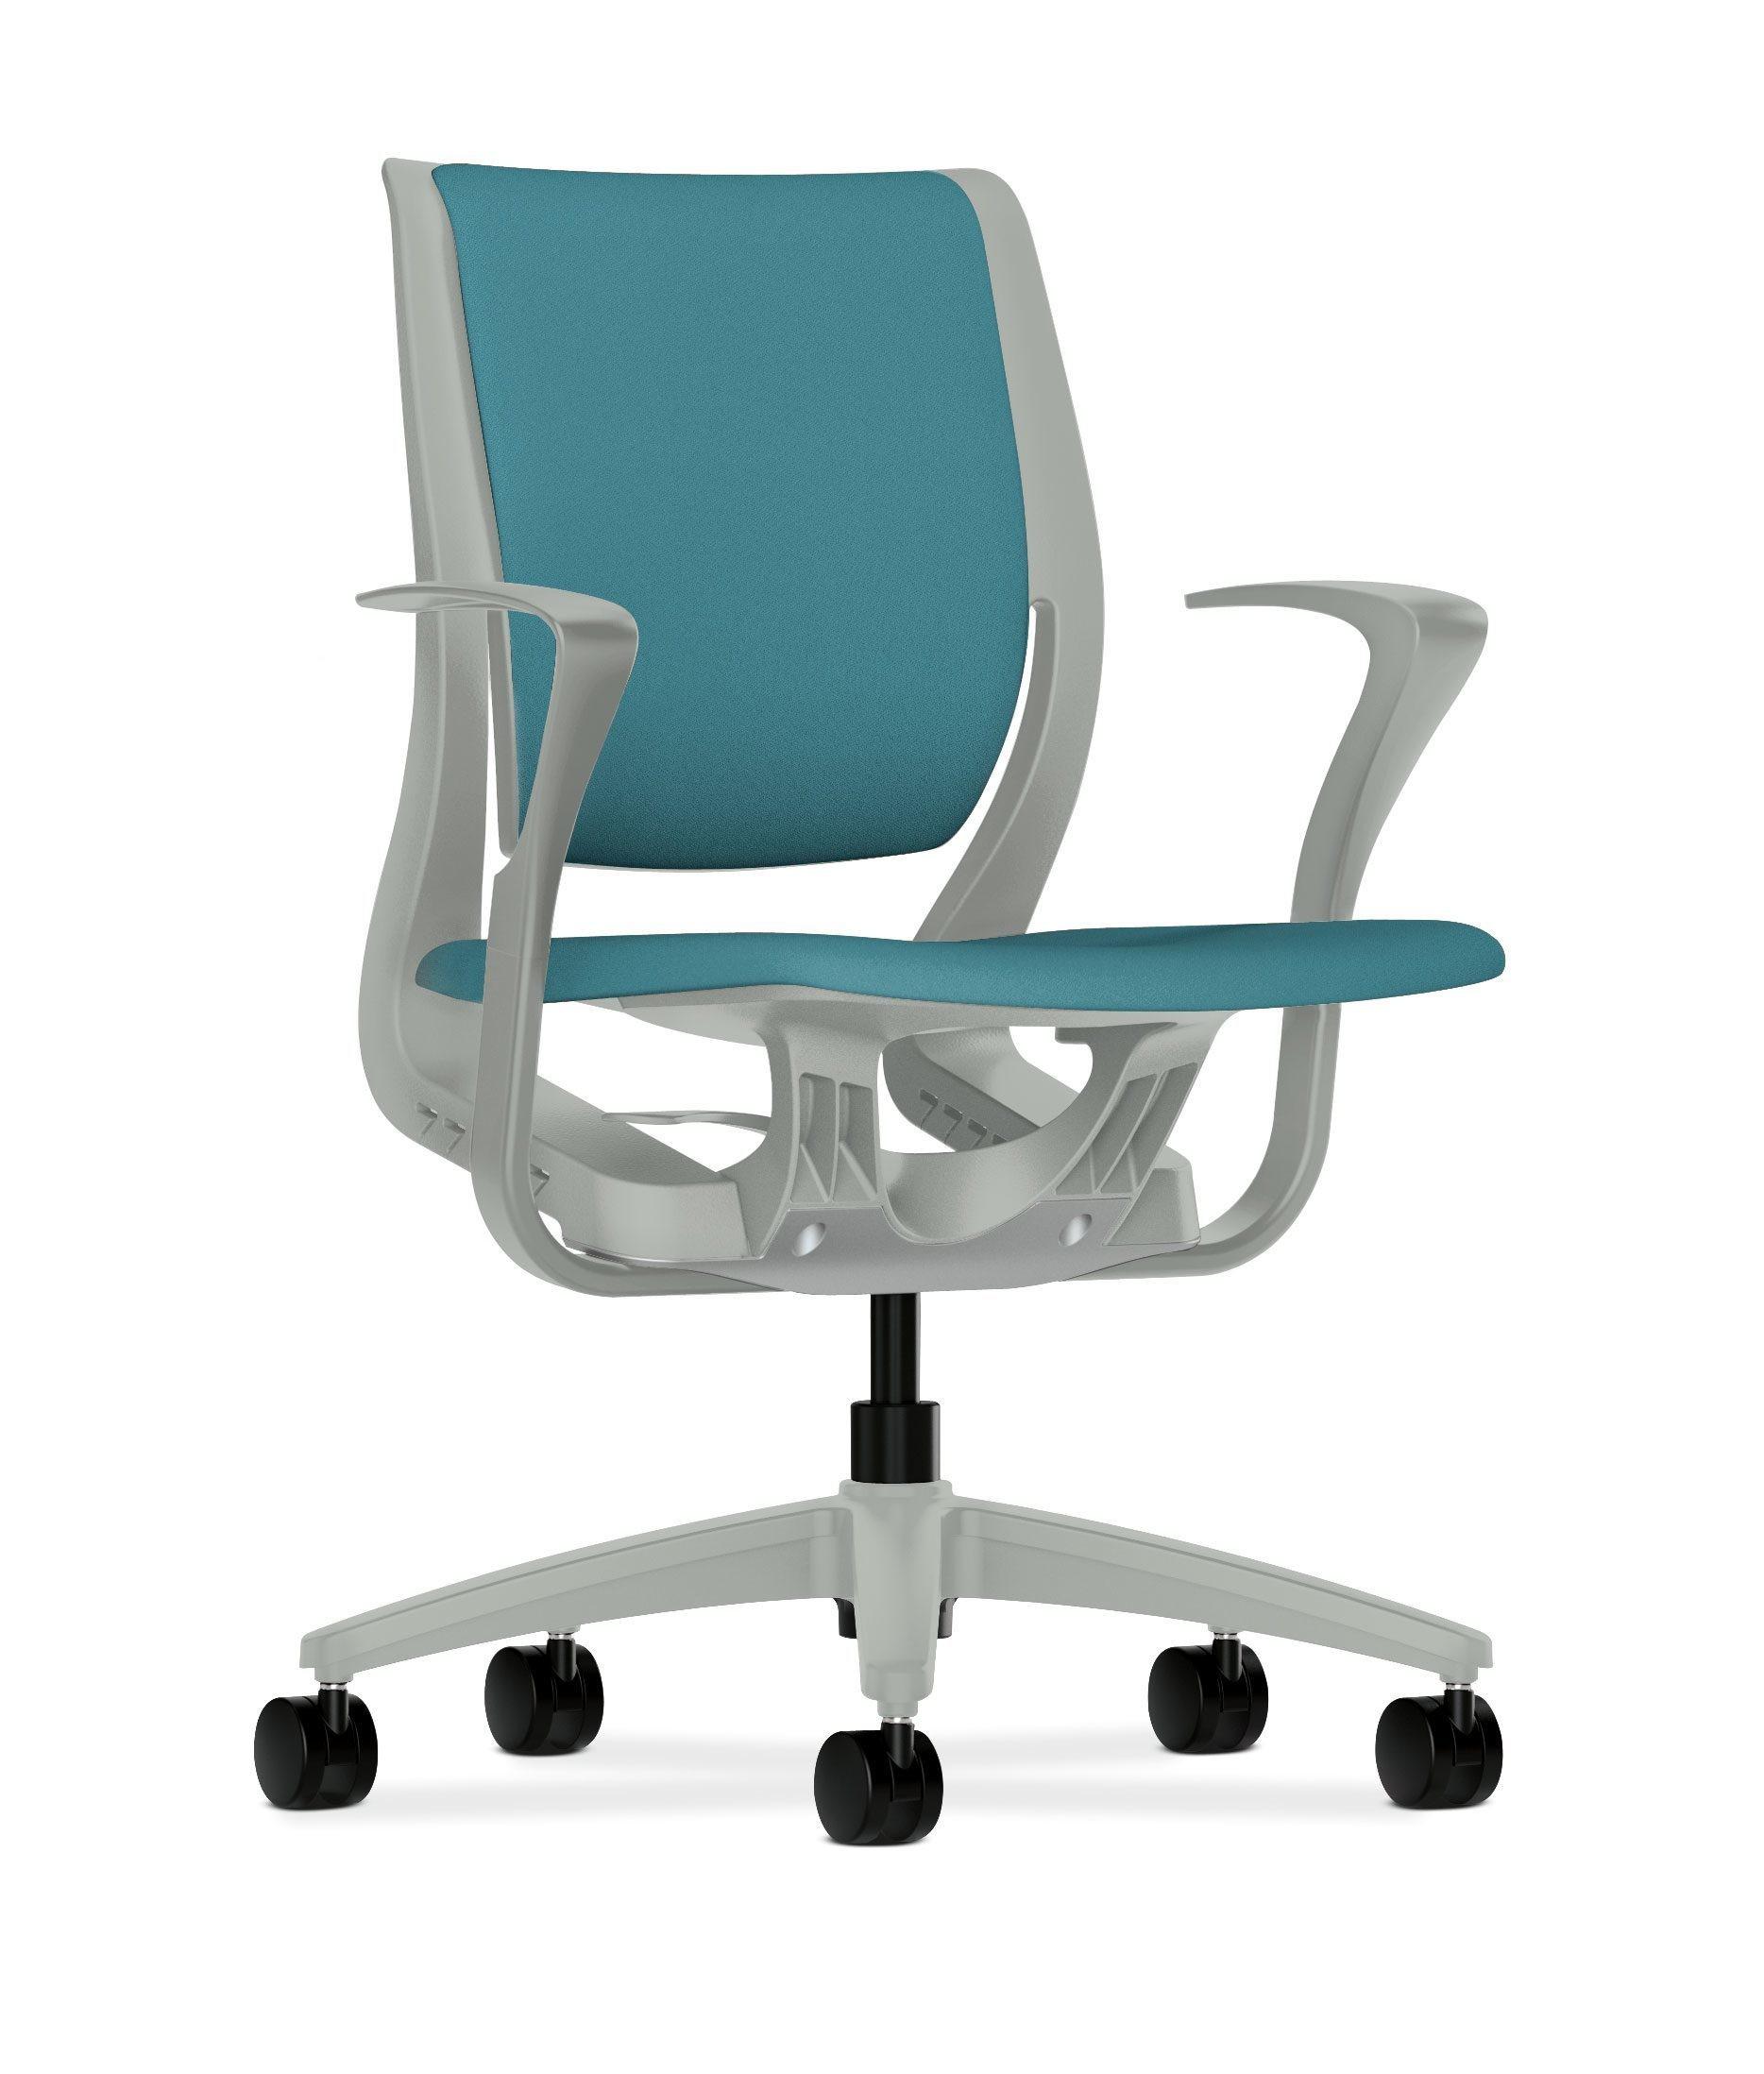 global furniture task office chair reviews big and tall chairs staples hon purpose studio 71 gsa bpa furnishings